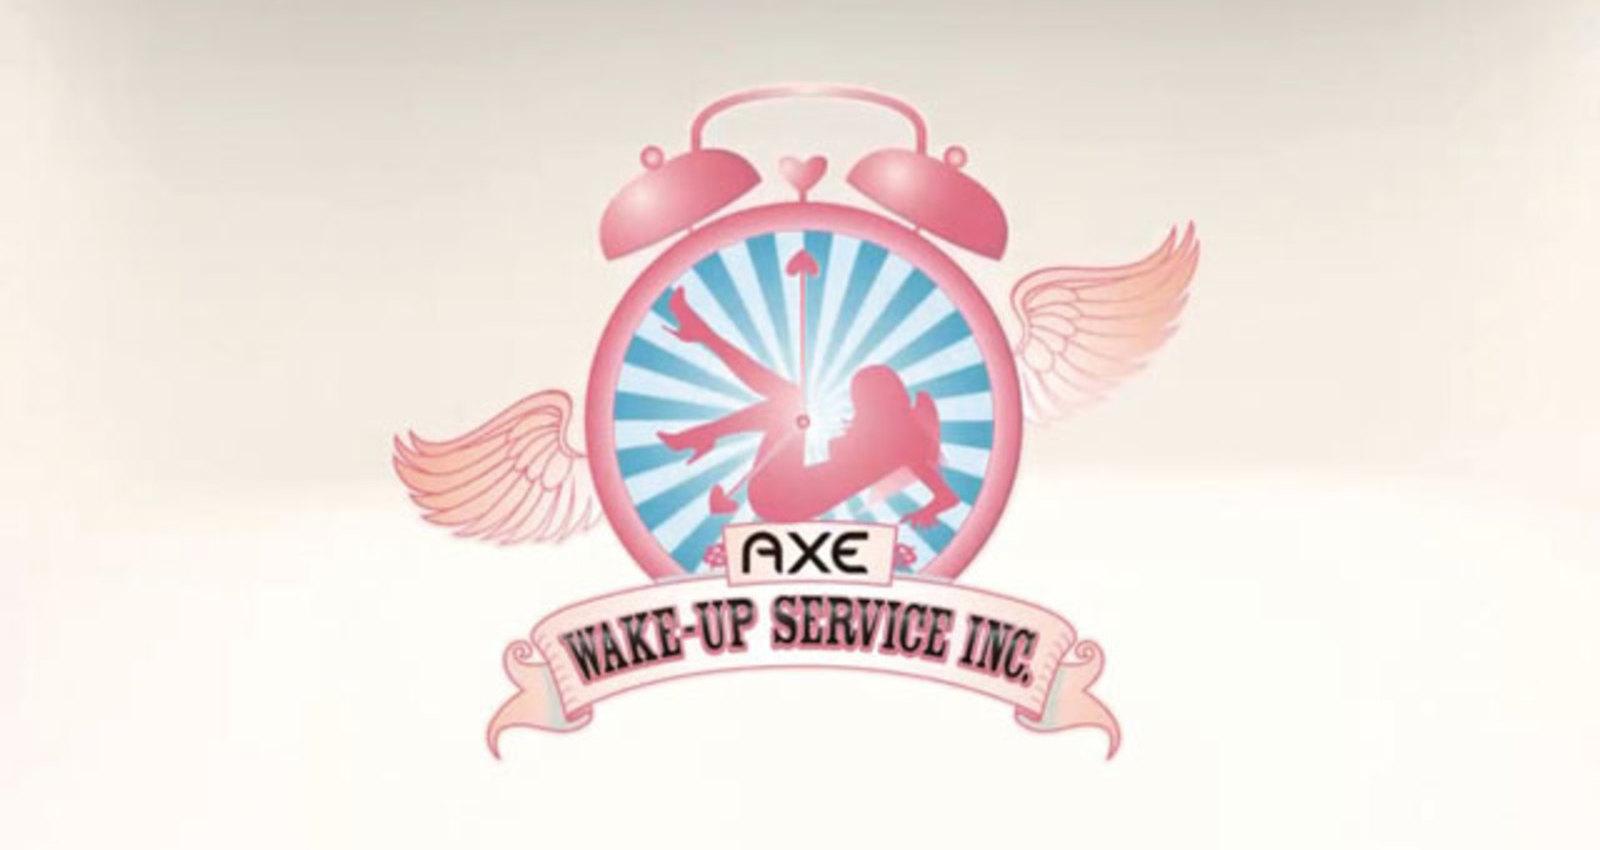 AXE WAKE-UP SERVICE INC.